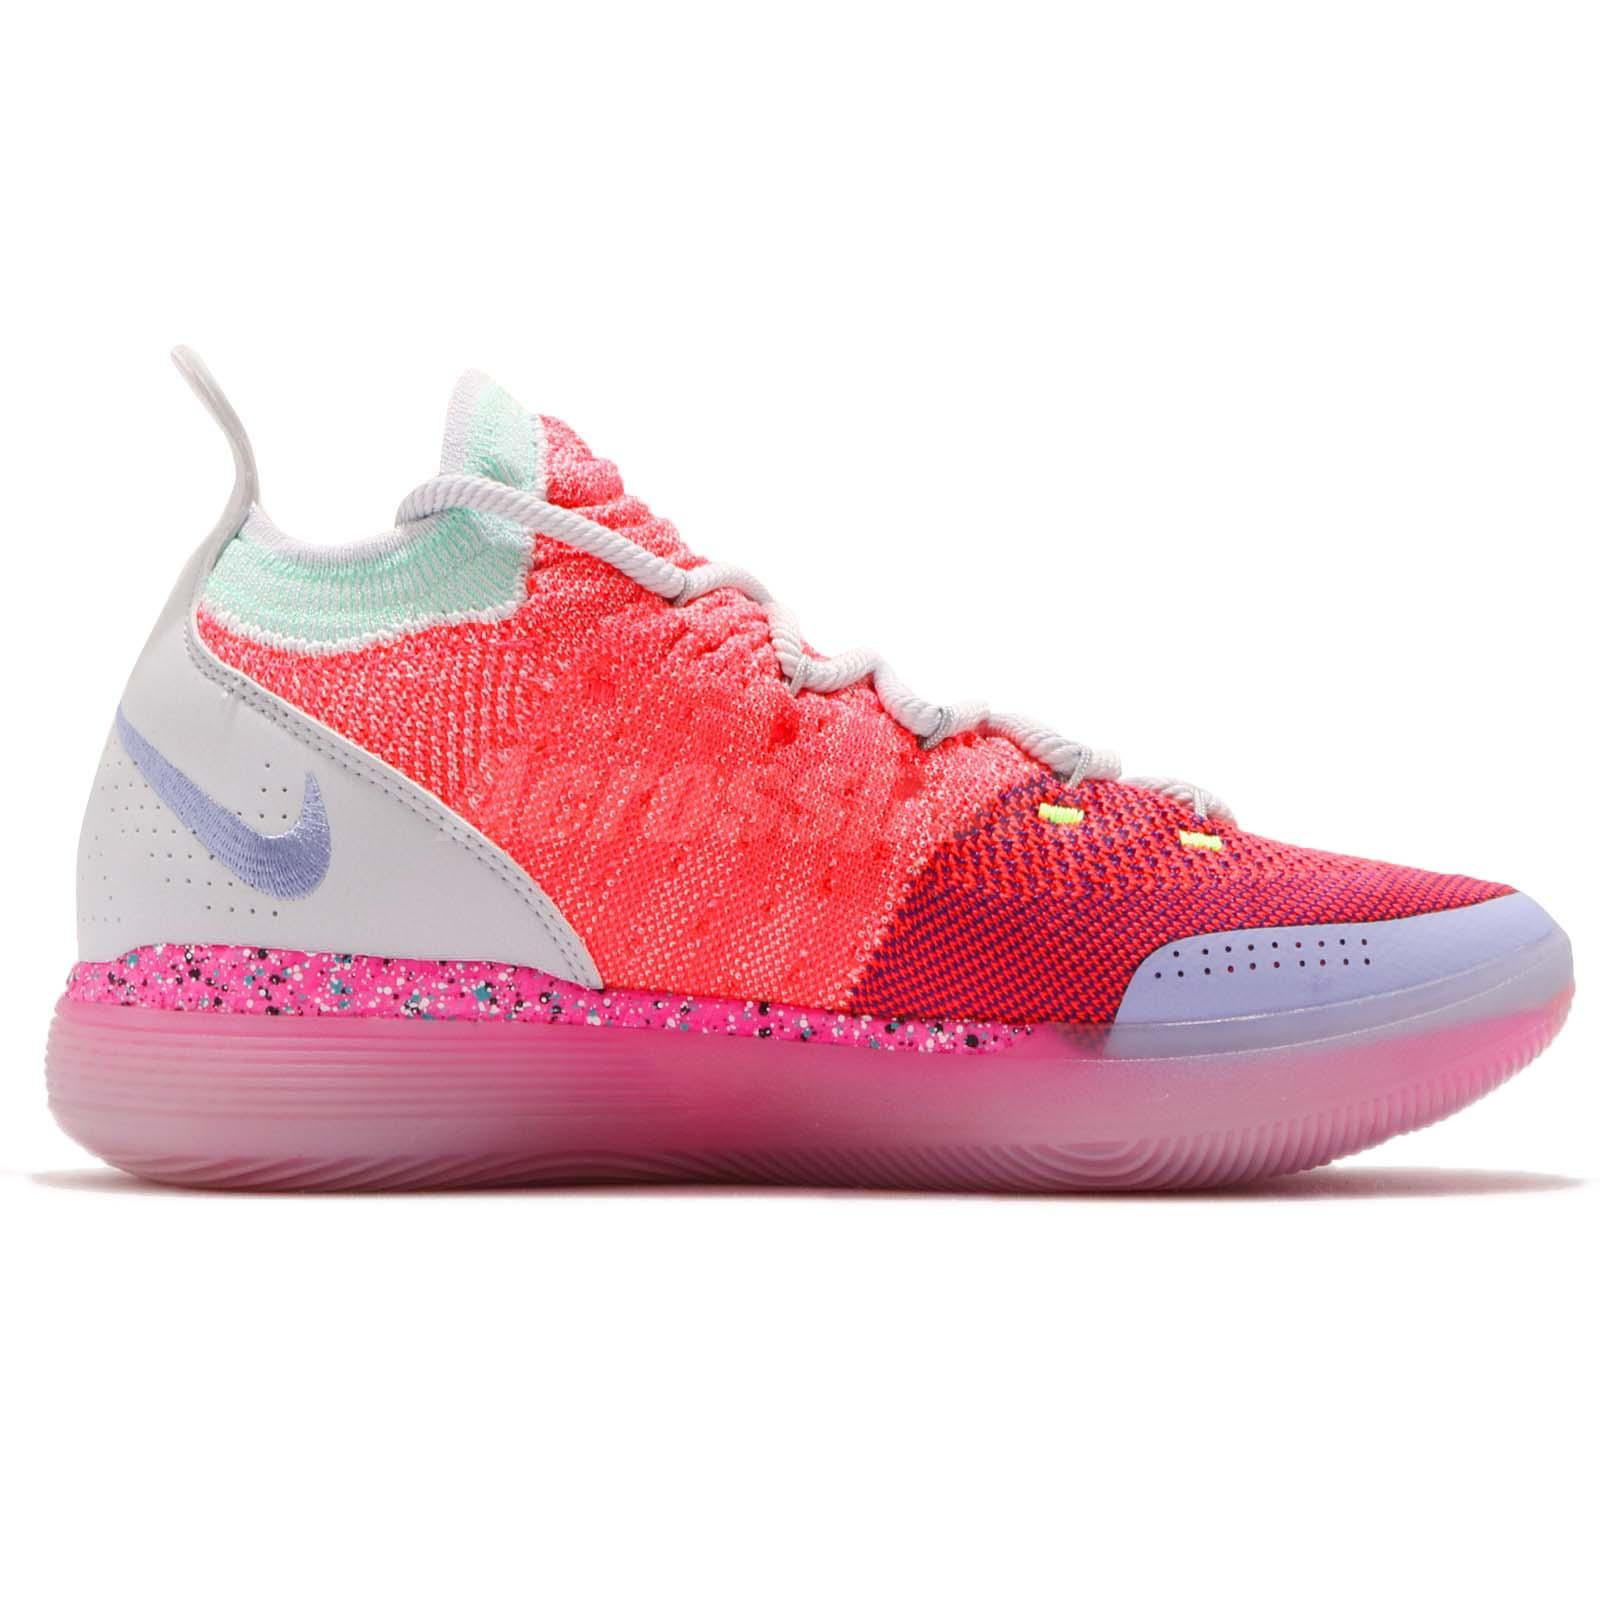 9523e5372e4 Nike Zoom KD 11 EP XI EYBL Peach Jam Hot Punch Kevin Durant Men ...